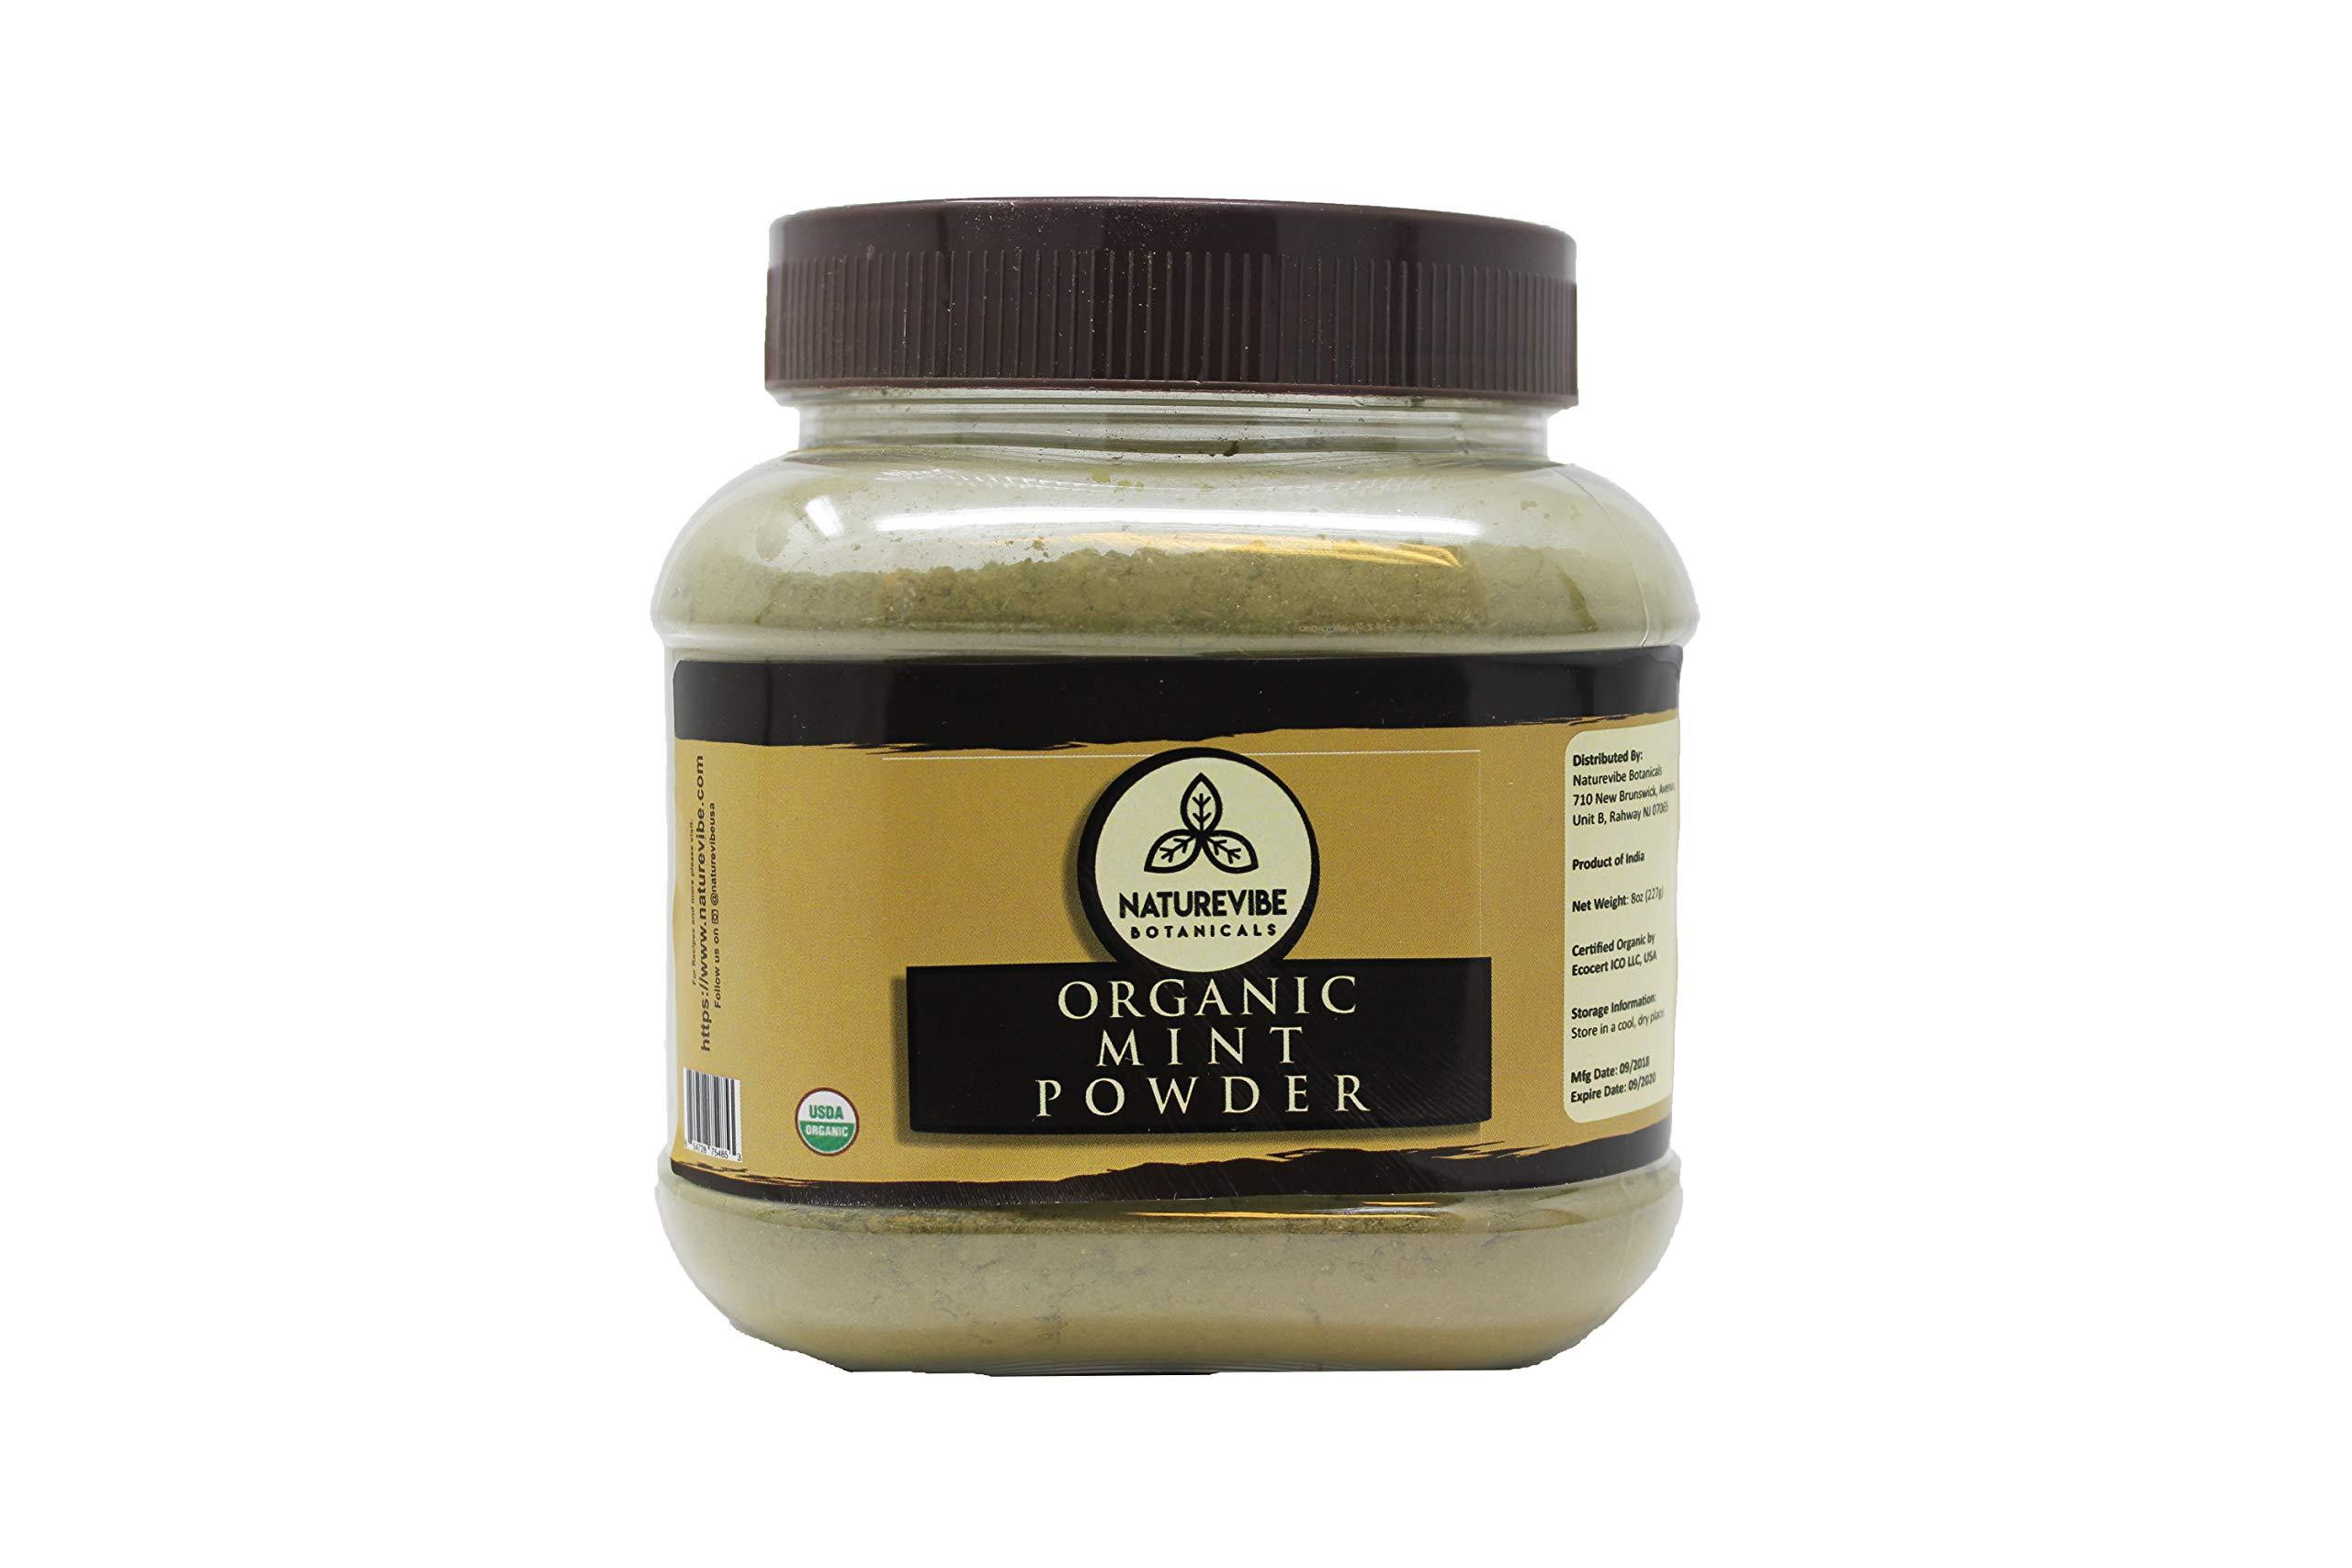 Organic Mint Powder (8oz) by Naturevibe Botanicals